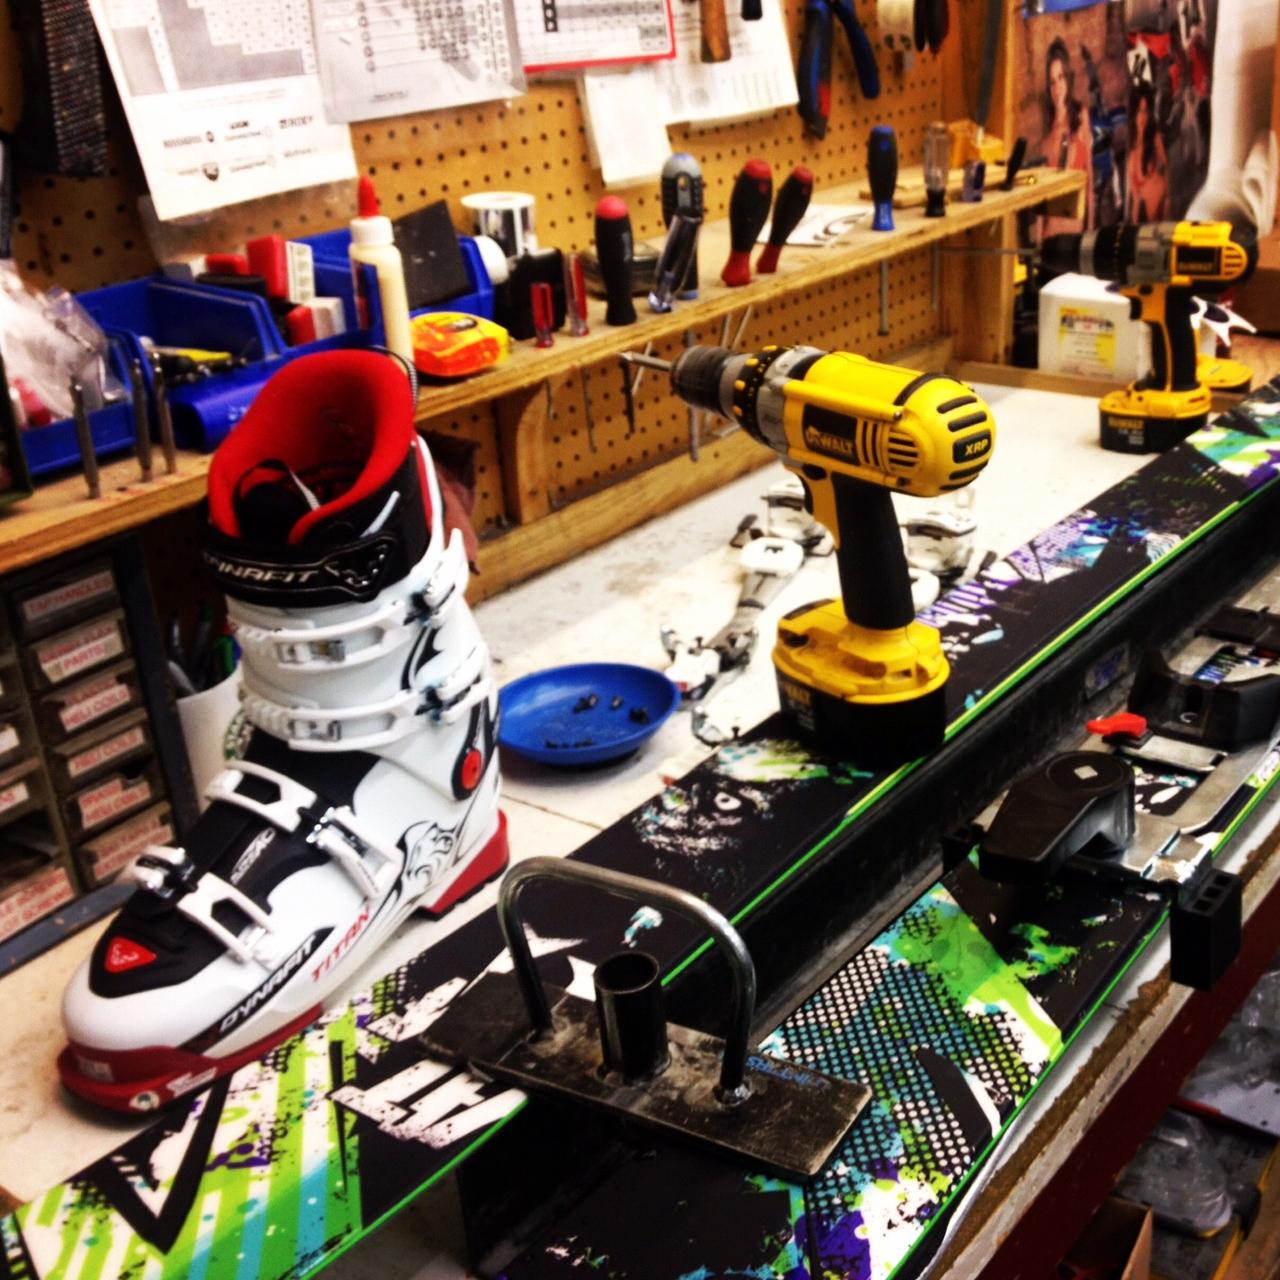 Inside a ski shop